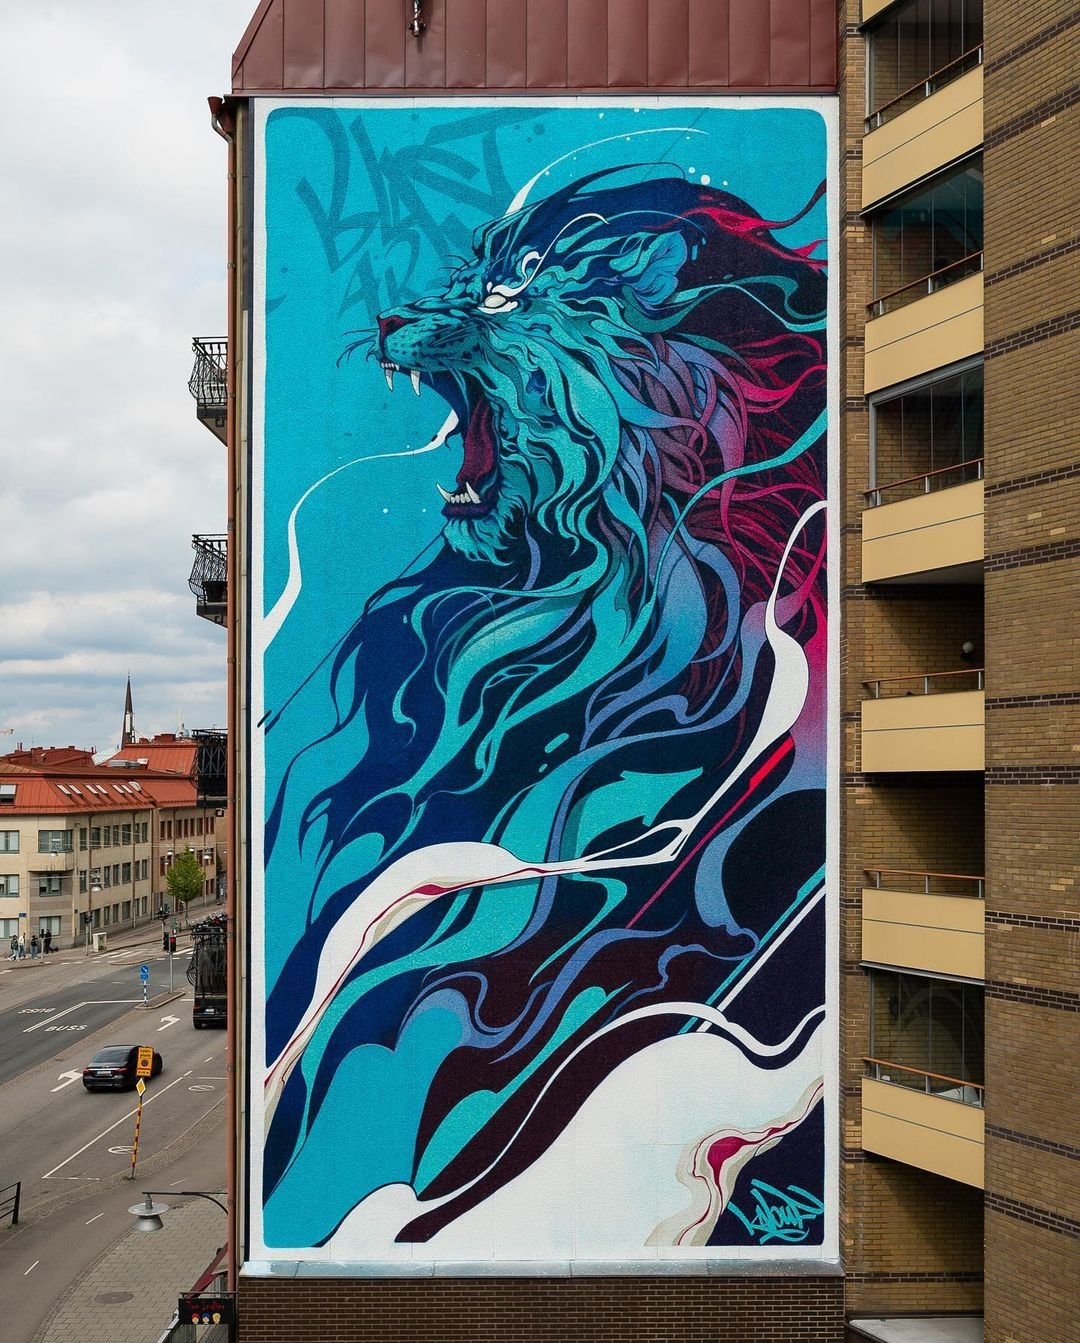 Kalouf @ Gothenburg, Sweden